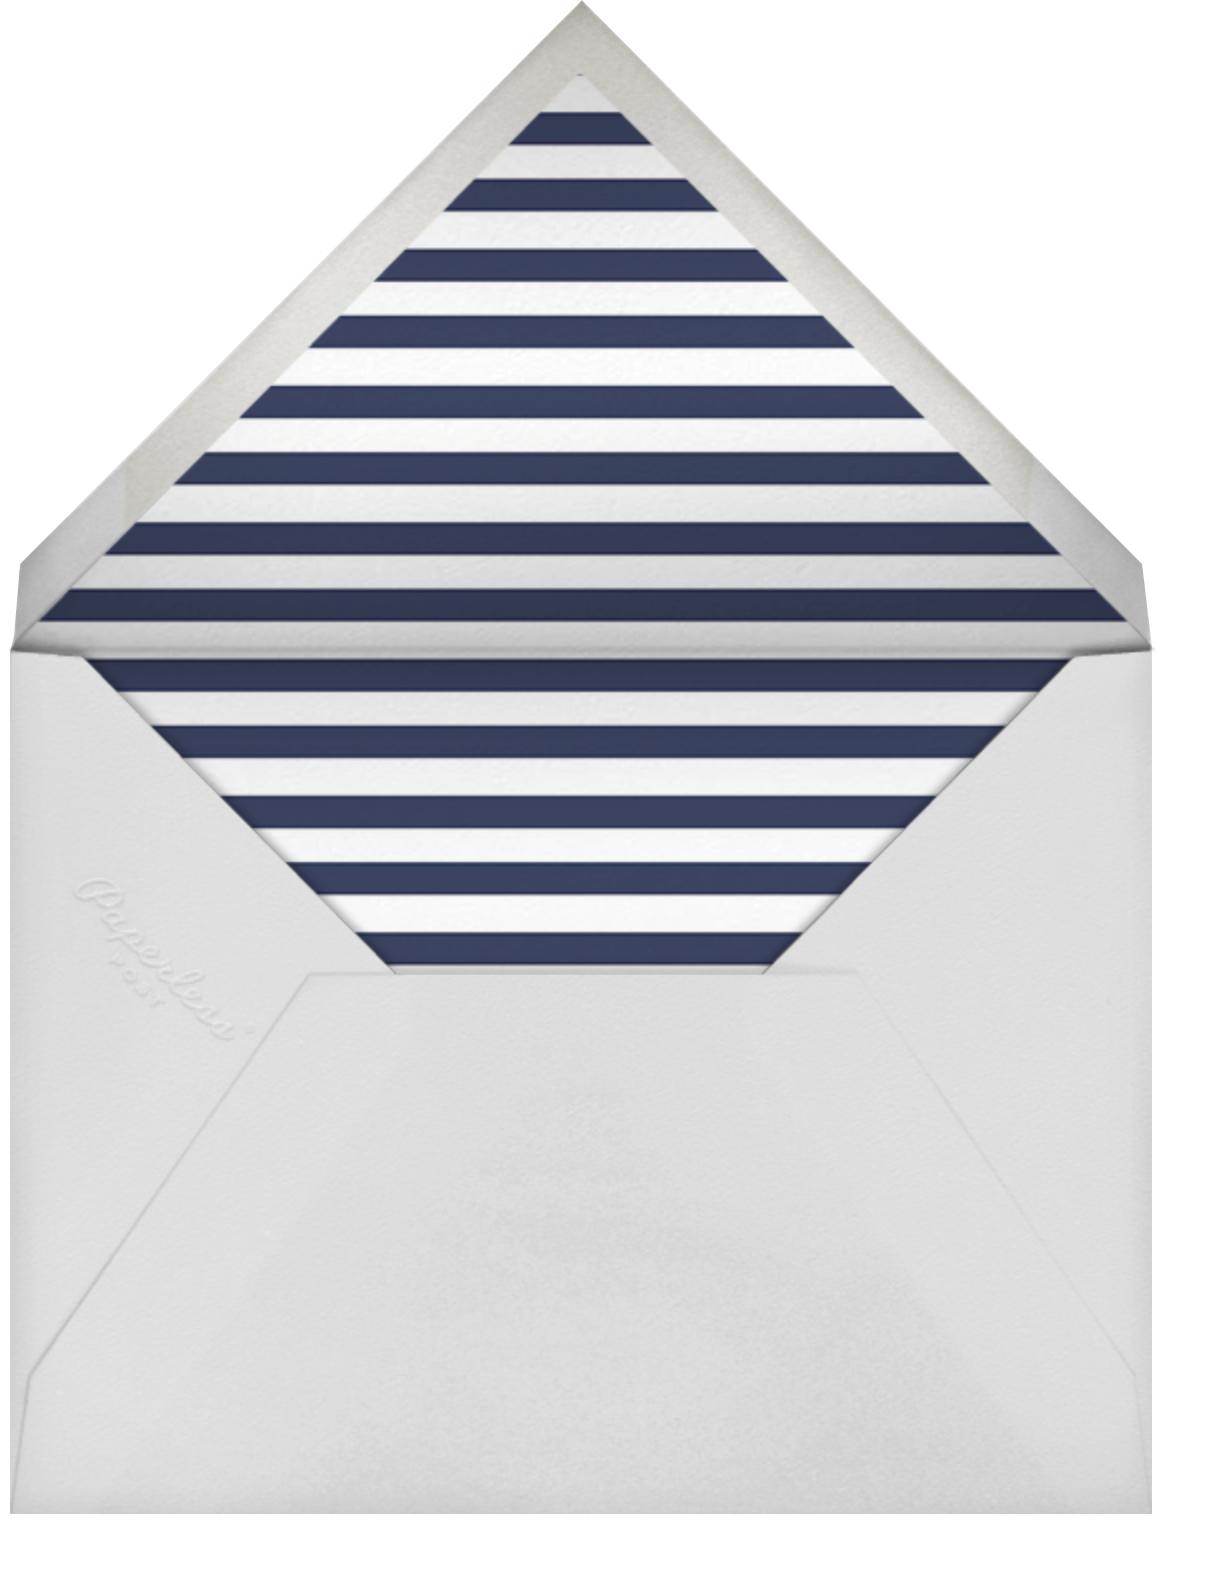 Confetti - Navy/Silver - kate spade new york - Bat and bar mitzvah - envelope back